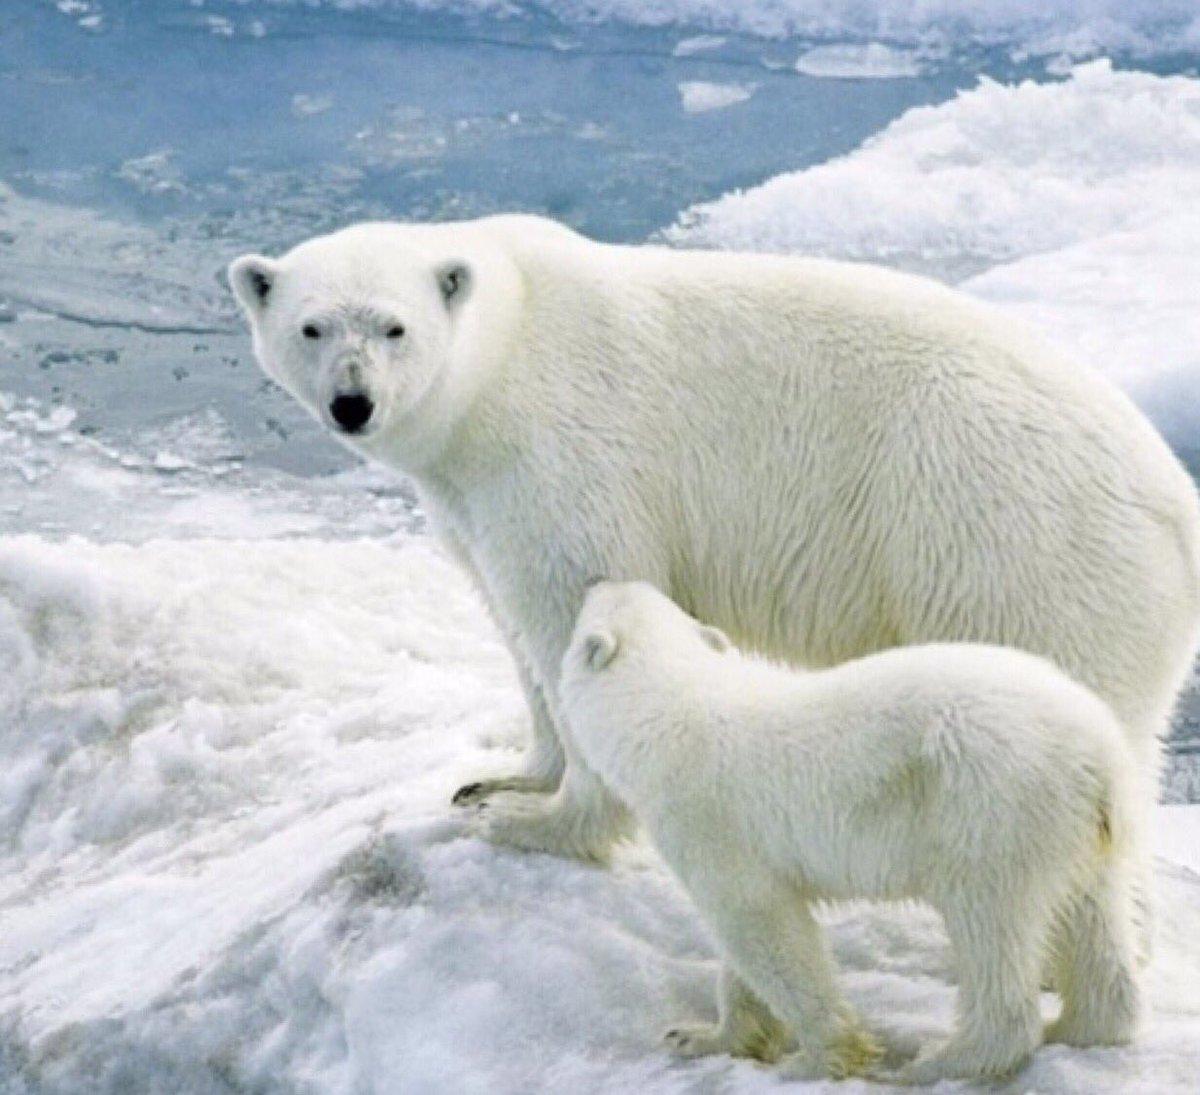 Good morning Apr.20 2017 9:17am Thur. #wildlife #SaveTheWhitebear #whitebears  #hunting #zoo #NHK <br>http://pic.twitter.com/3McUEjszeS